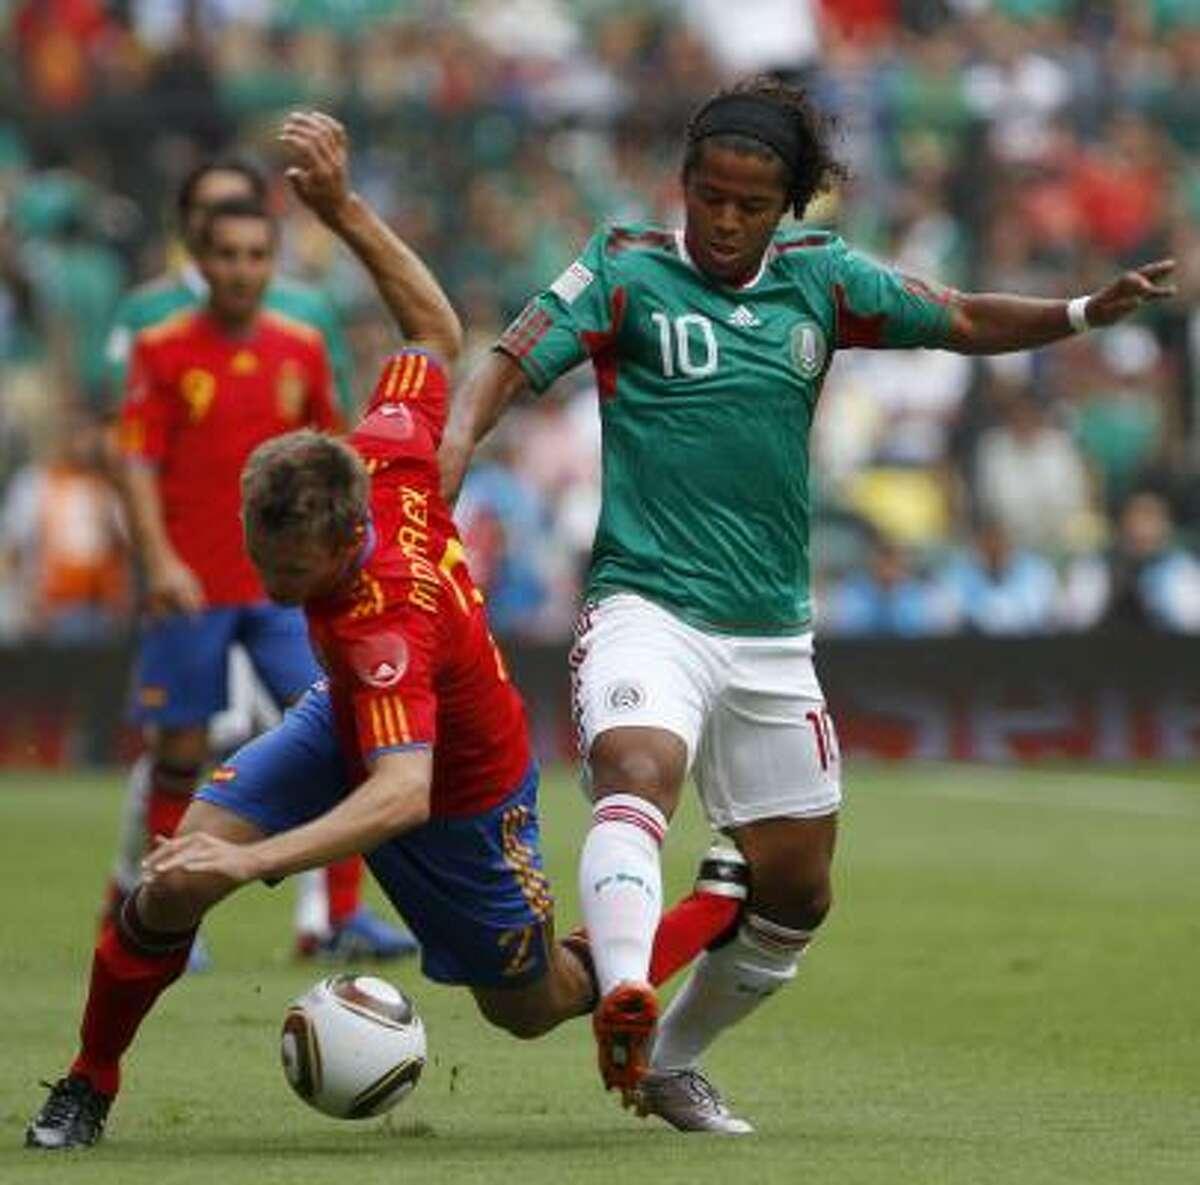 Spain's Ignacio Monreal, left, fights for the ball with Mexico's Giovani Dos Santos.